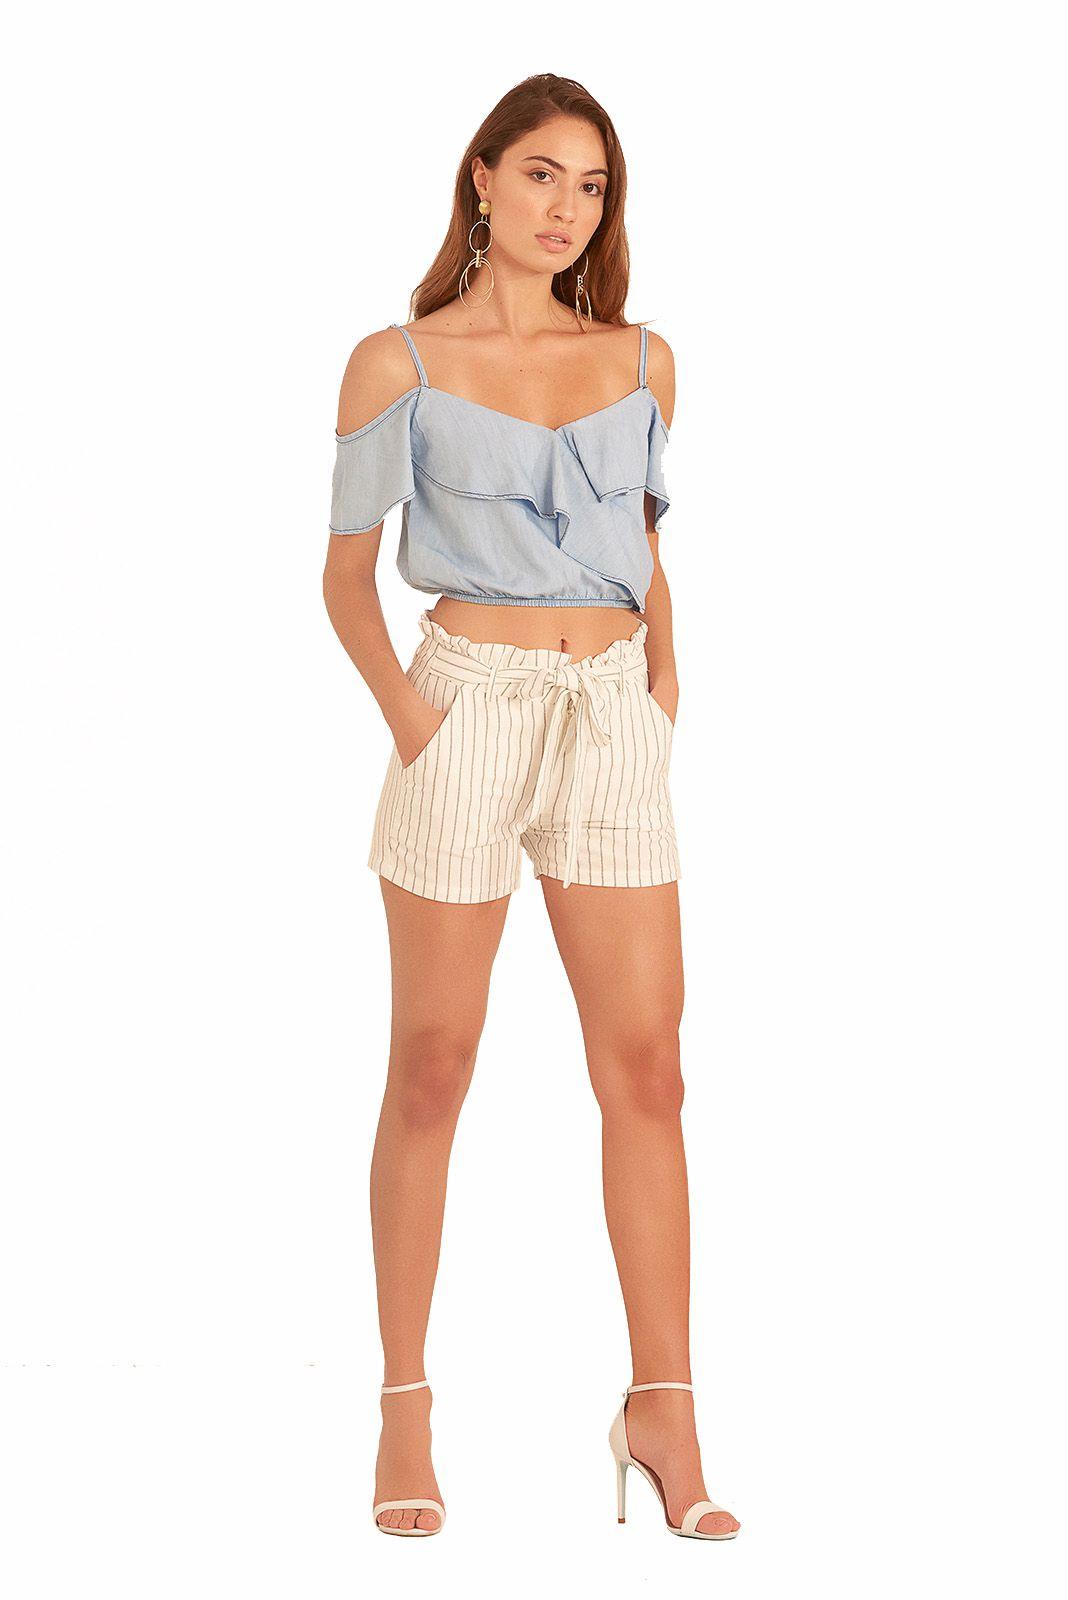 Shorts Pkd Clochard Listrado Branco